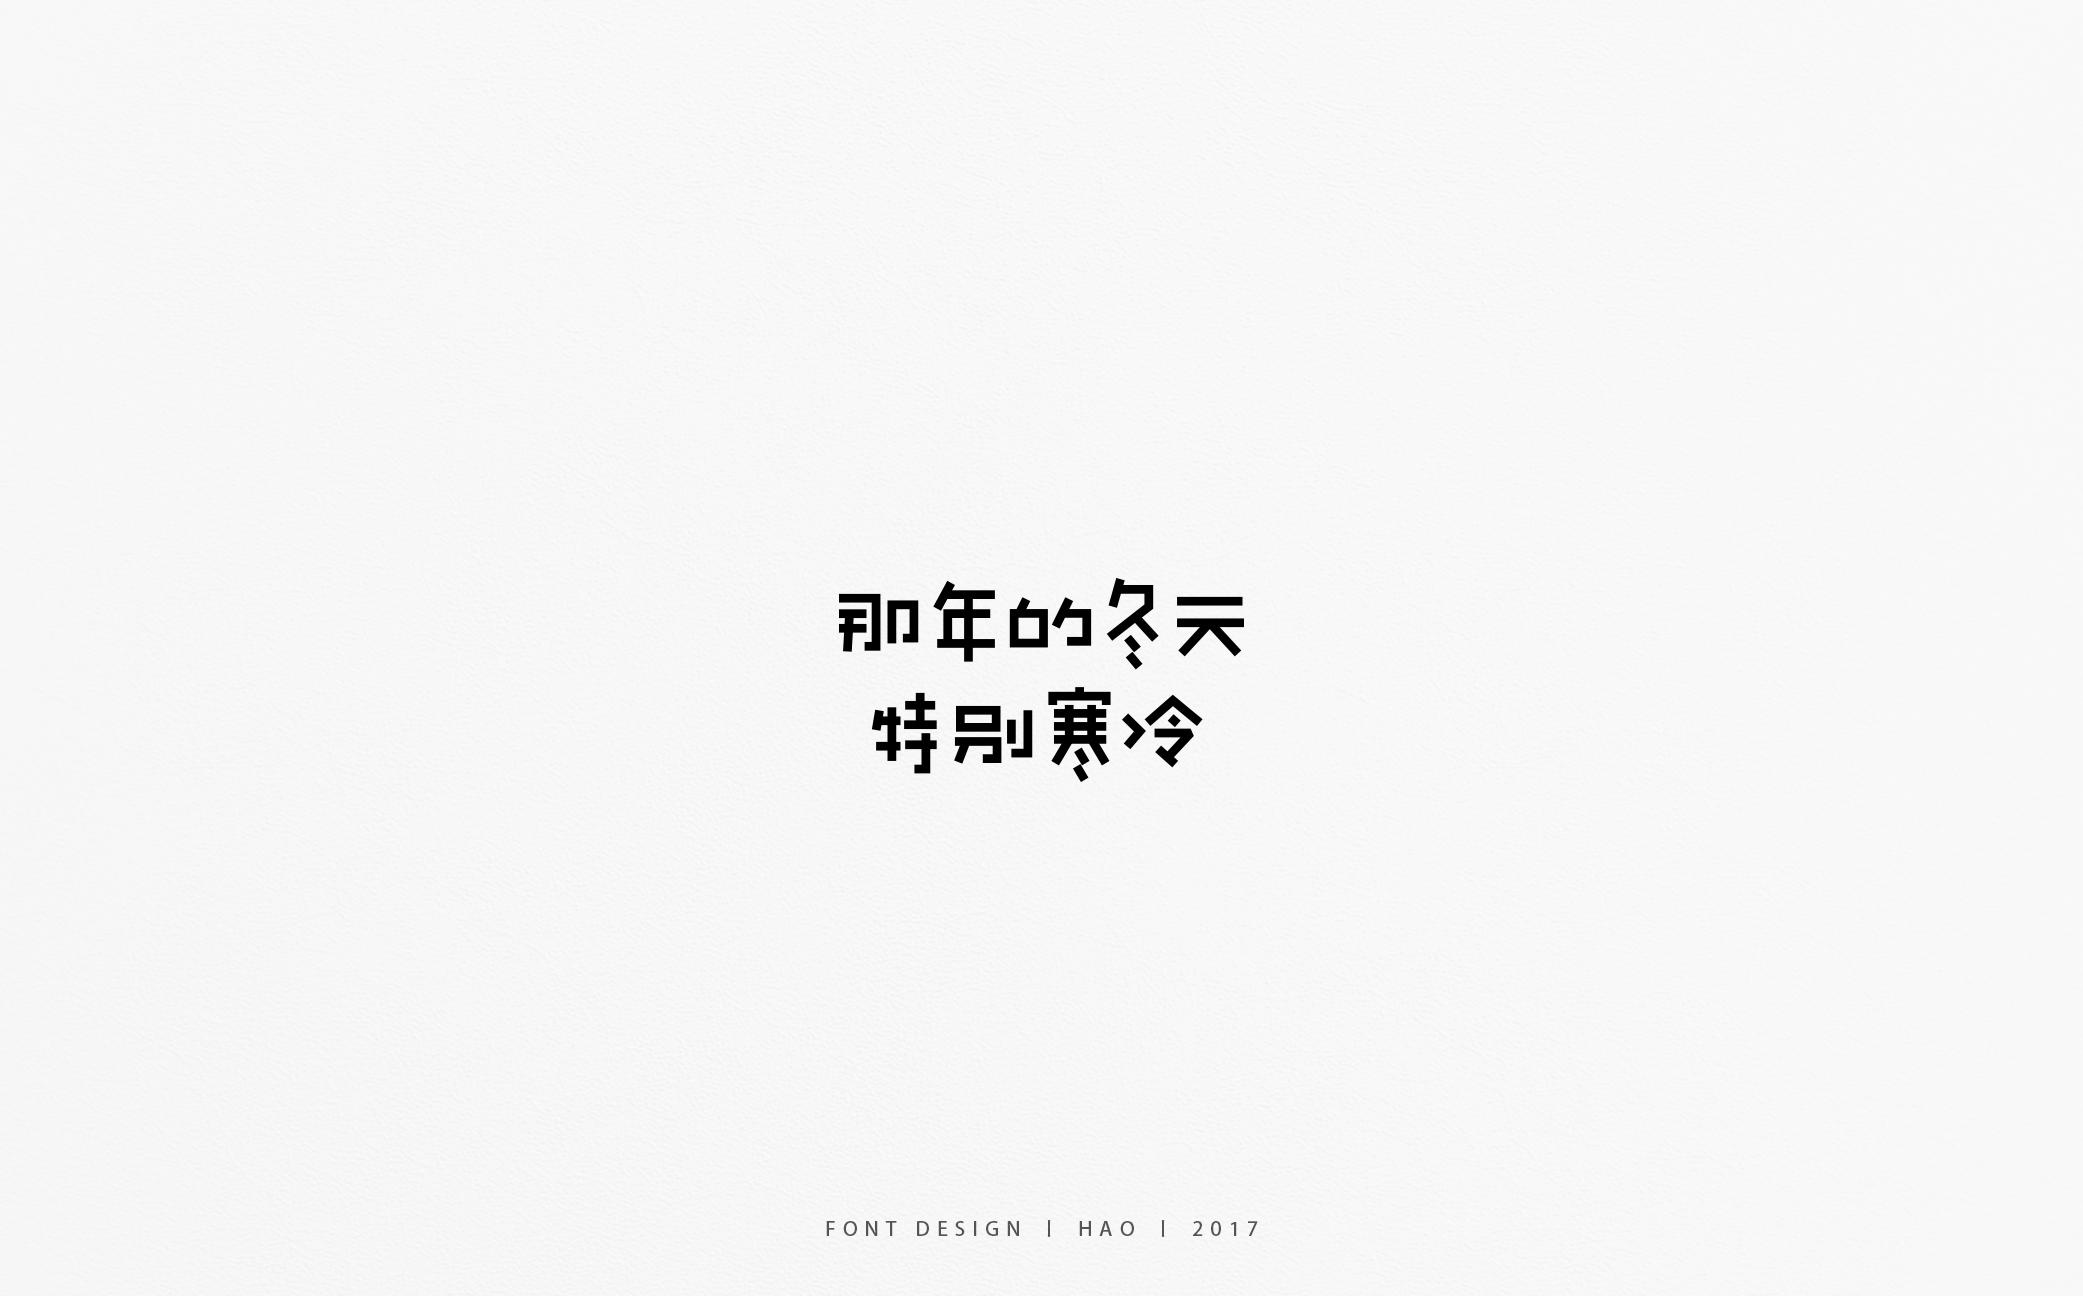 chinesefontdesign.com 2017 06 25 10 51 51 833049 29P Creative Chinese font logo style design   Warm煦煦